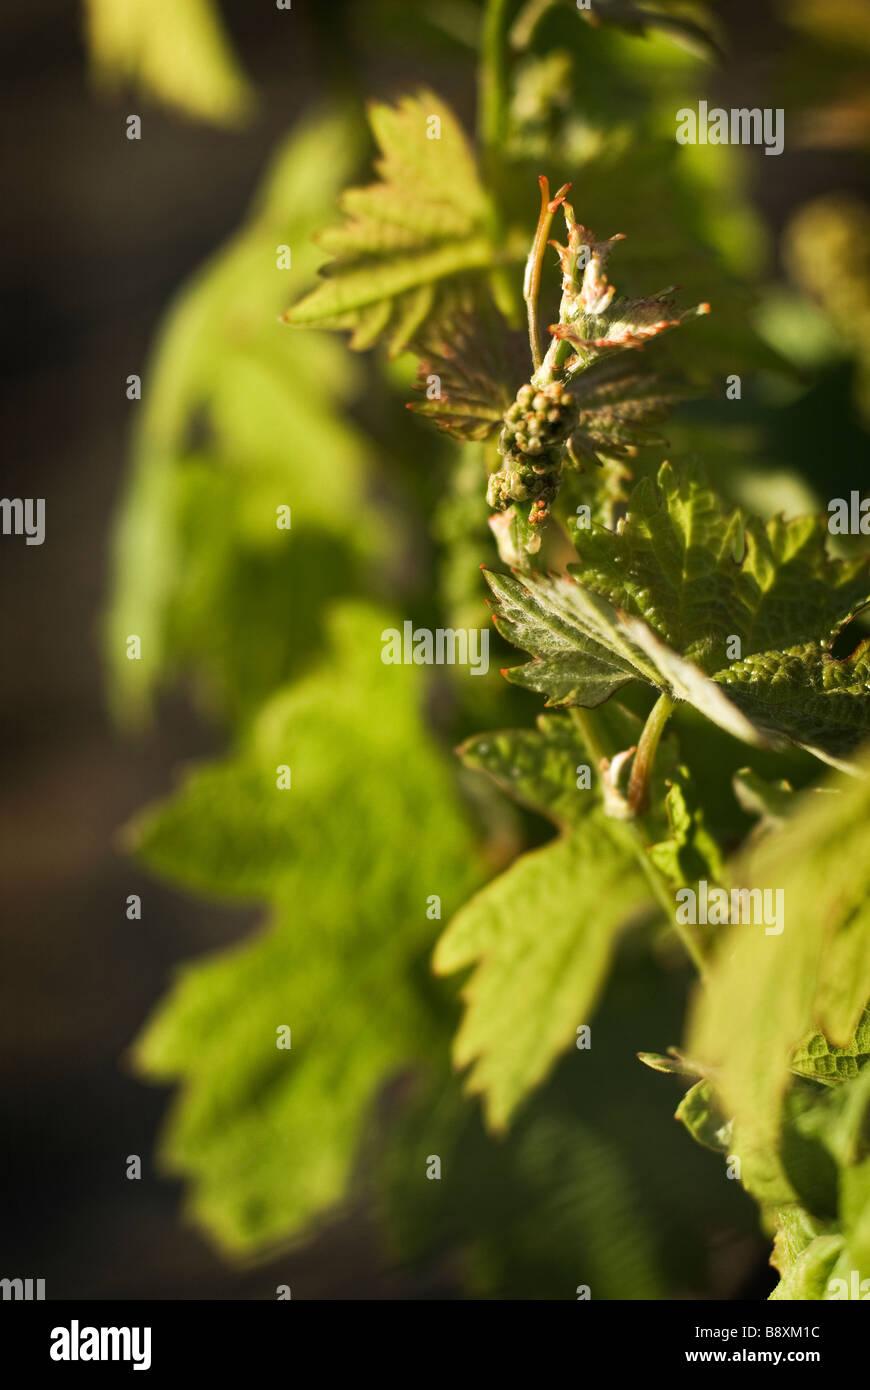 wine vineyard crop - Stock Image